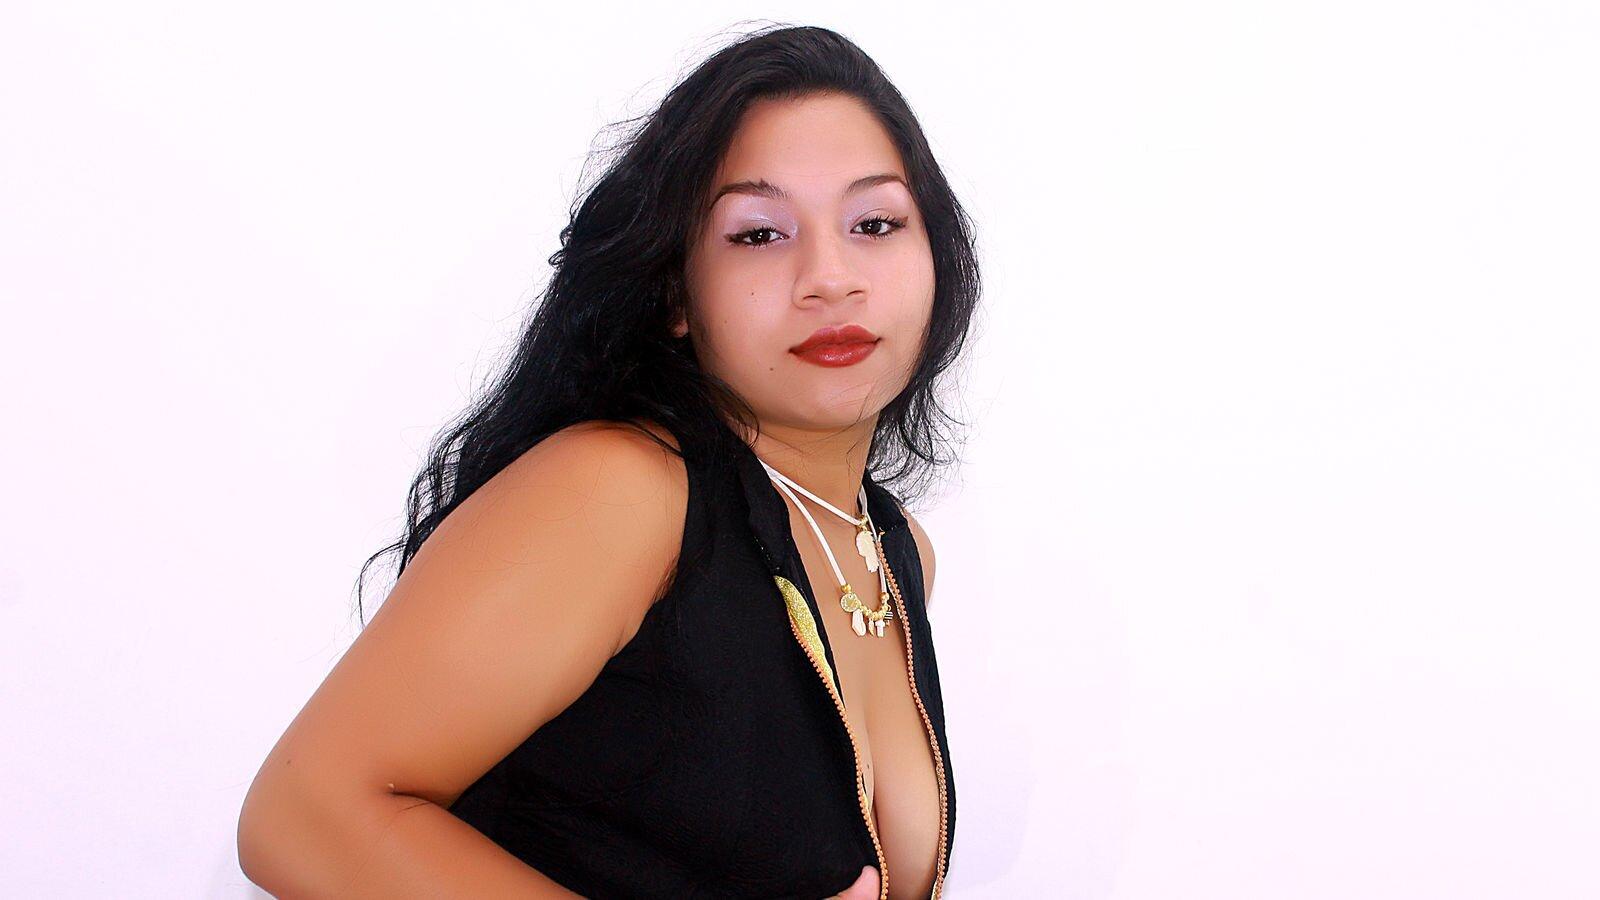 NicoleBlondie